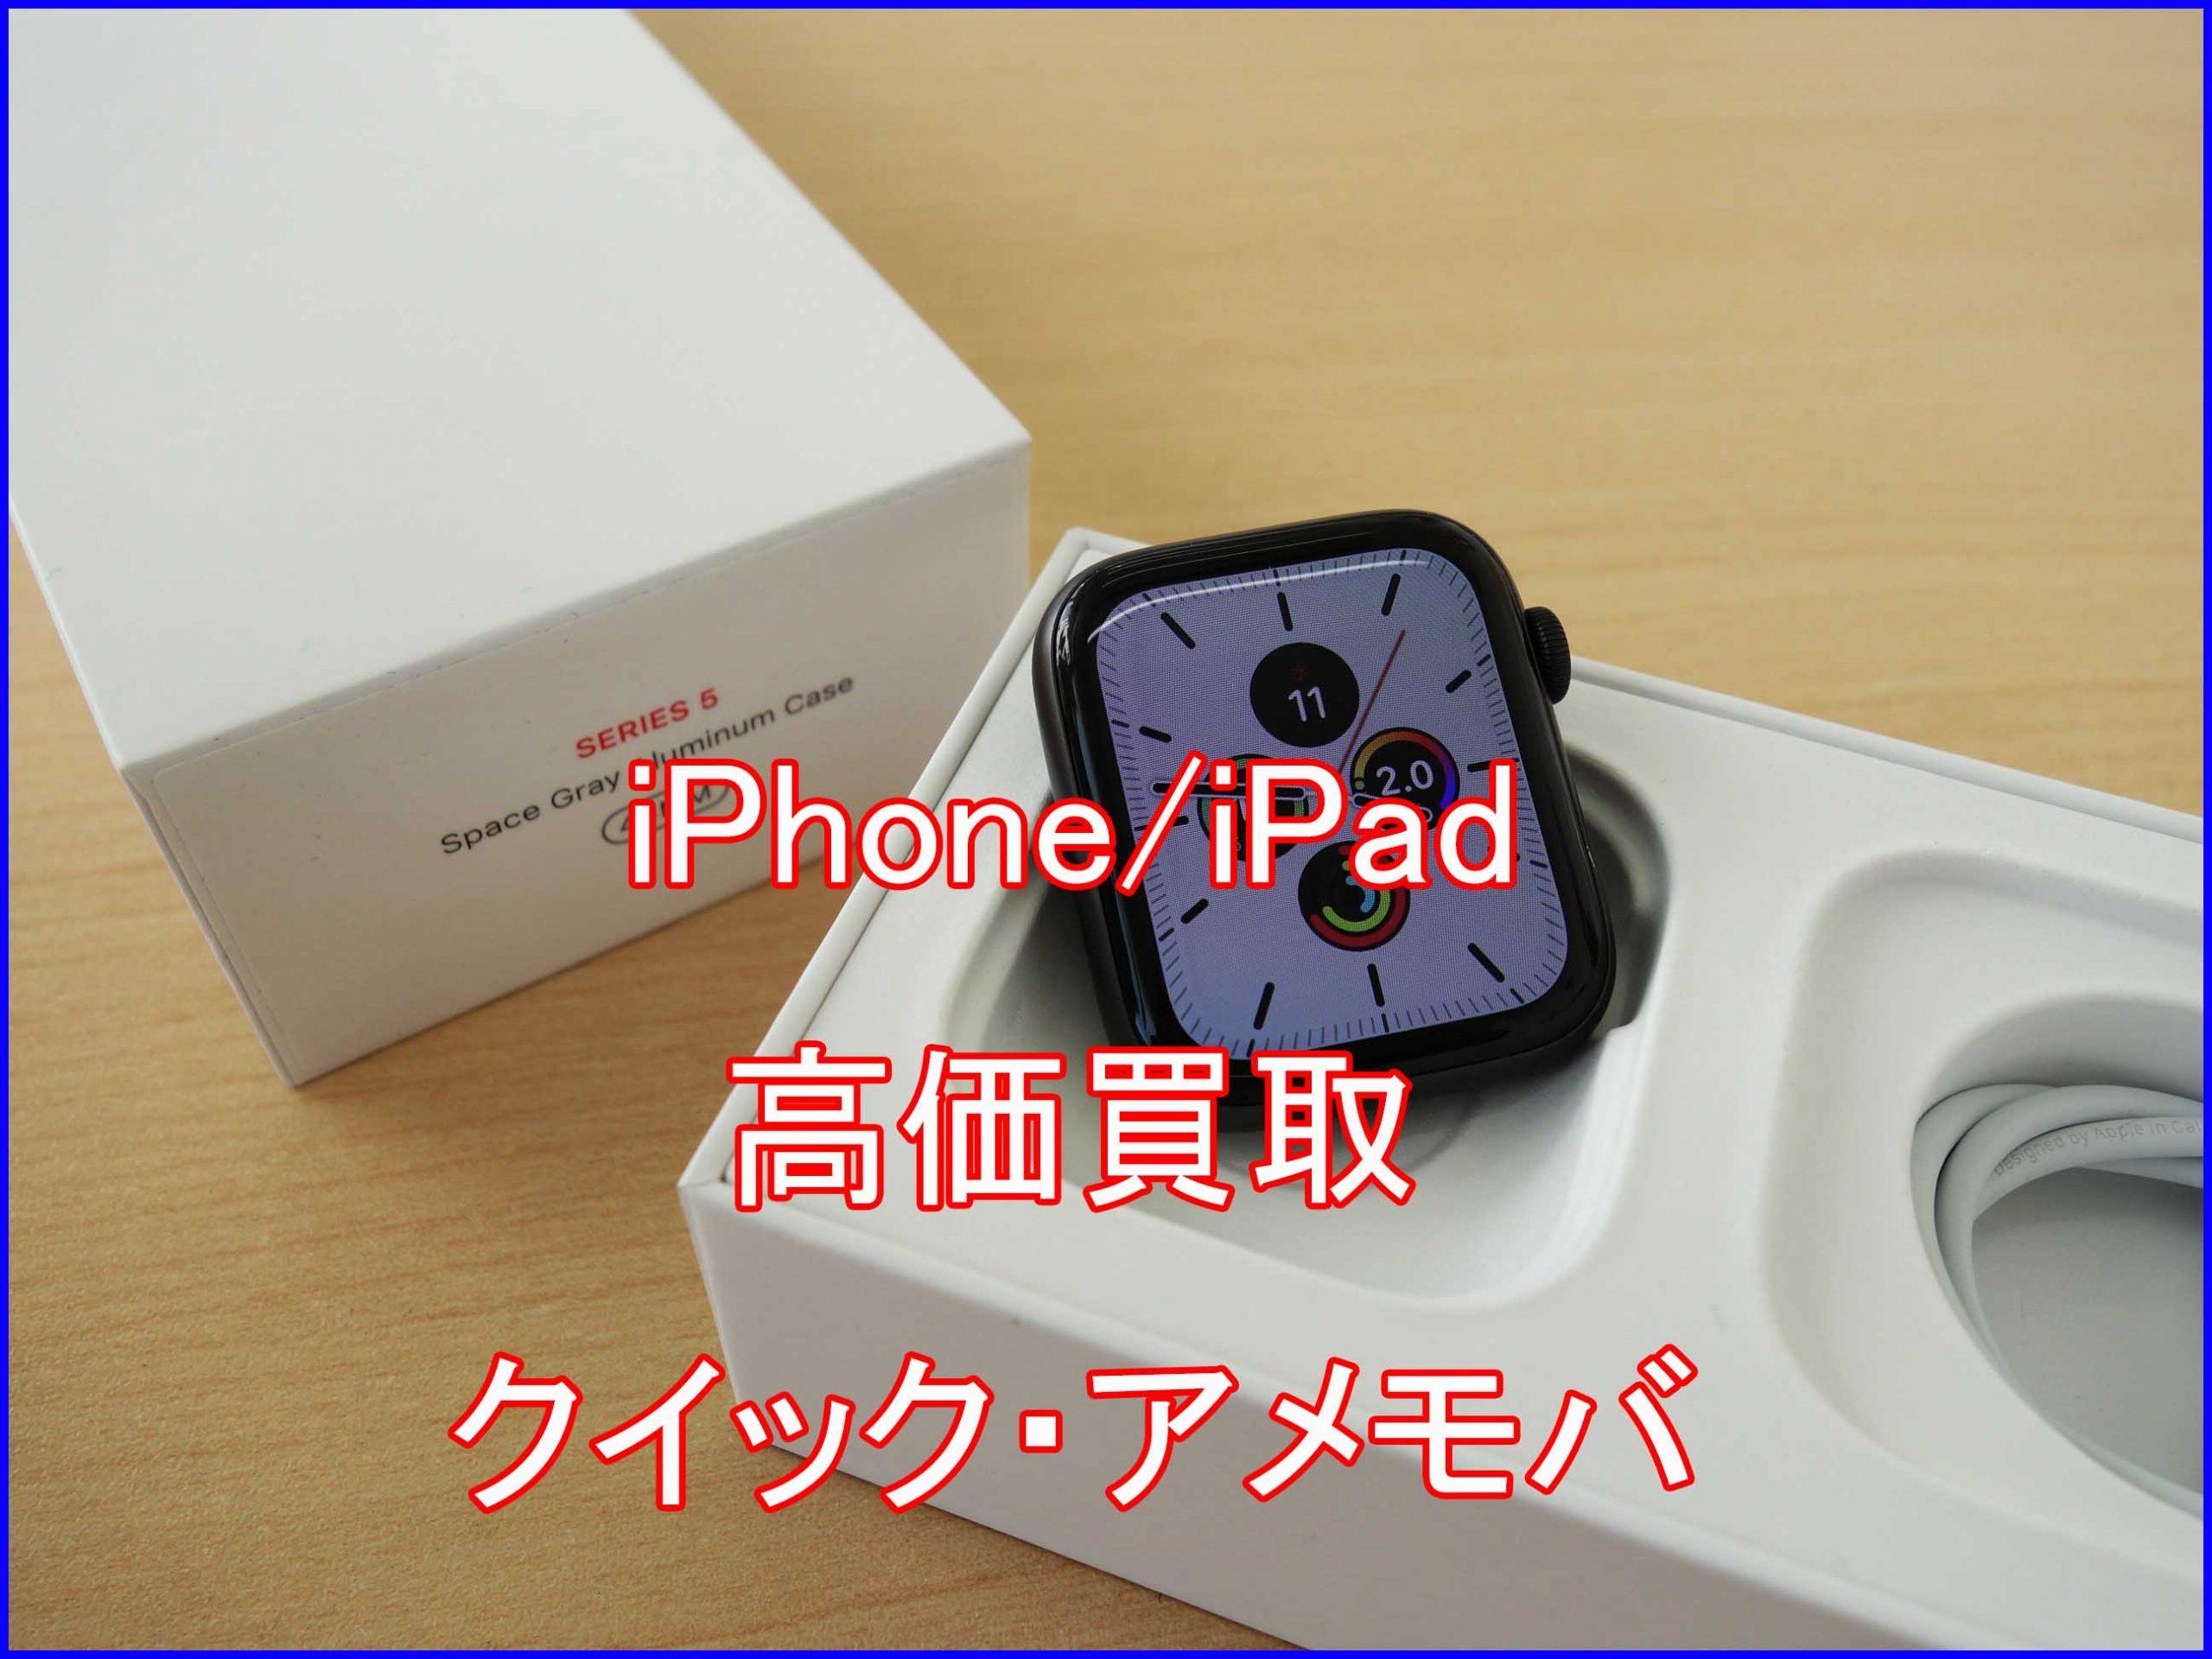 Apple Watchを買い取りました!アイフォン買取のクイック岐阜